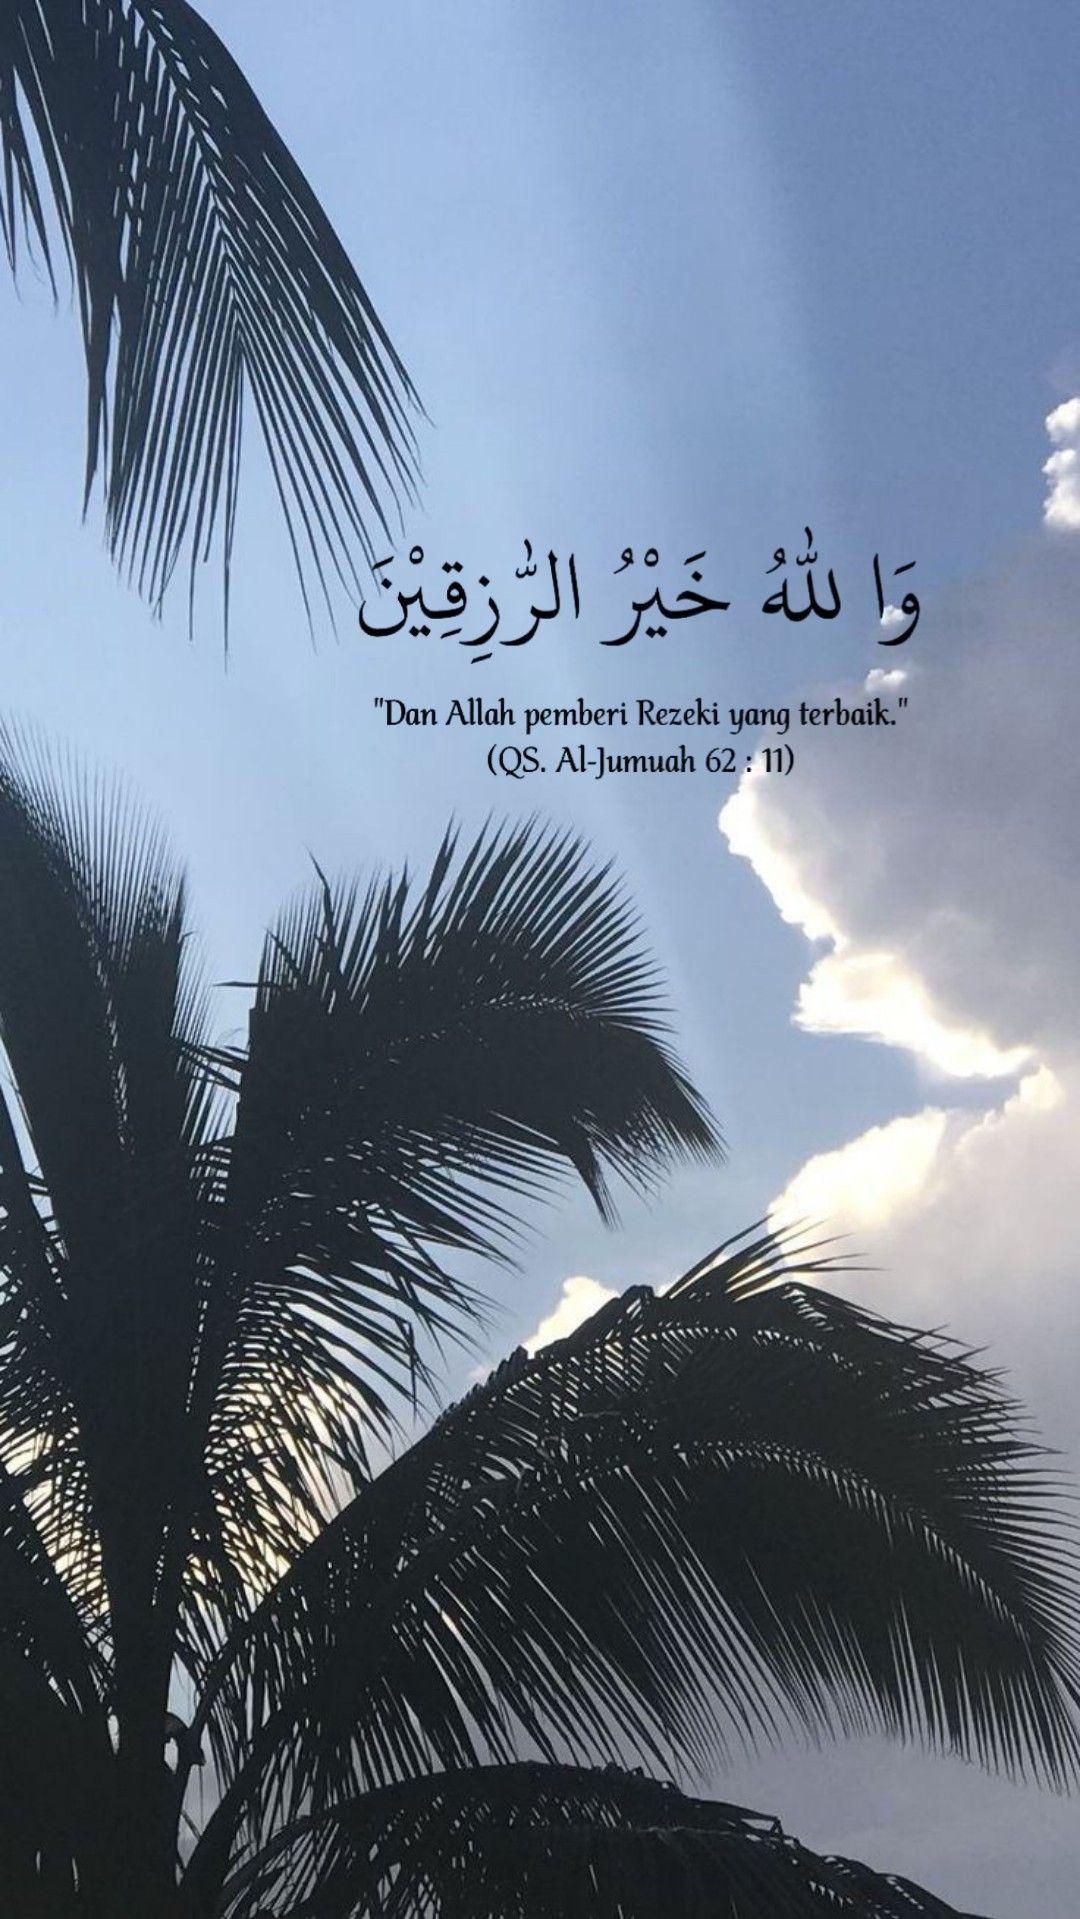 Ayat Alquran Tentang Rezeki : alquran, tentang, rezeki, Al-Jumuah, Kitab, Allah,, Pelajaran, Hidup,, Quran